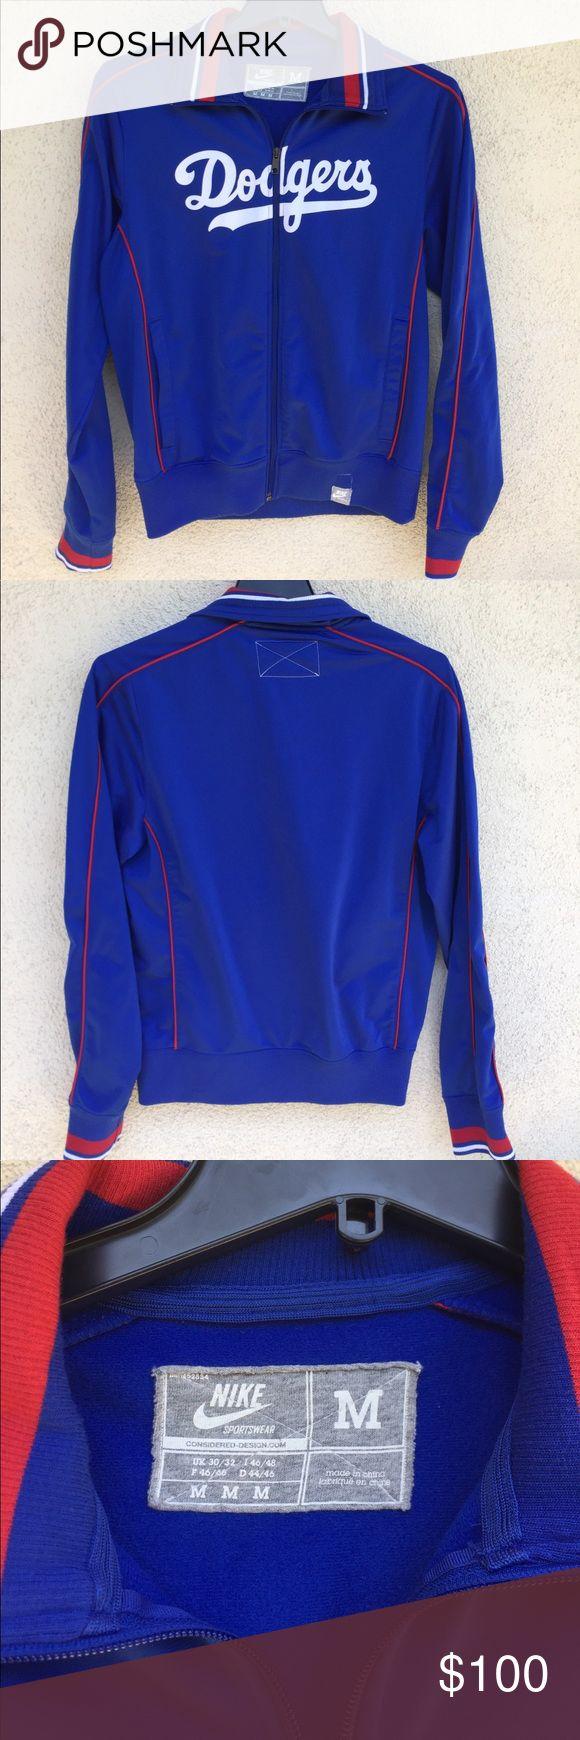 Nike Dodgers jacket Awesome condition Nike Jackets & Coats